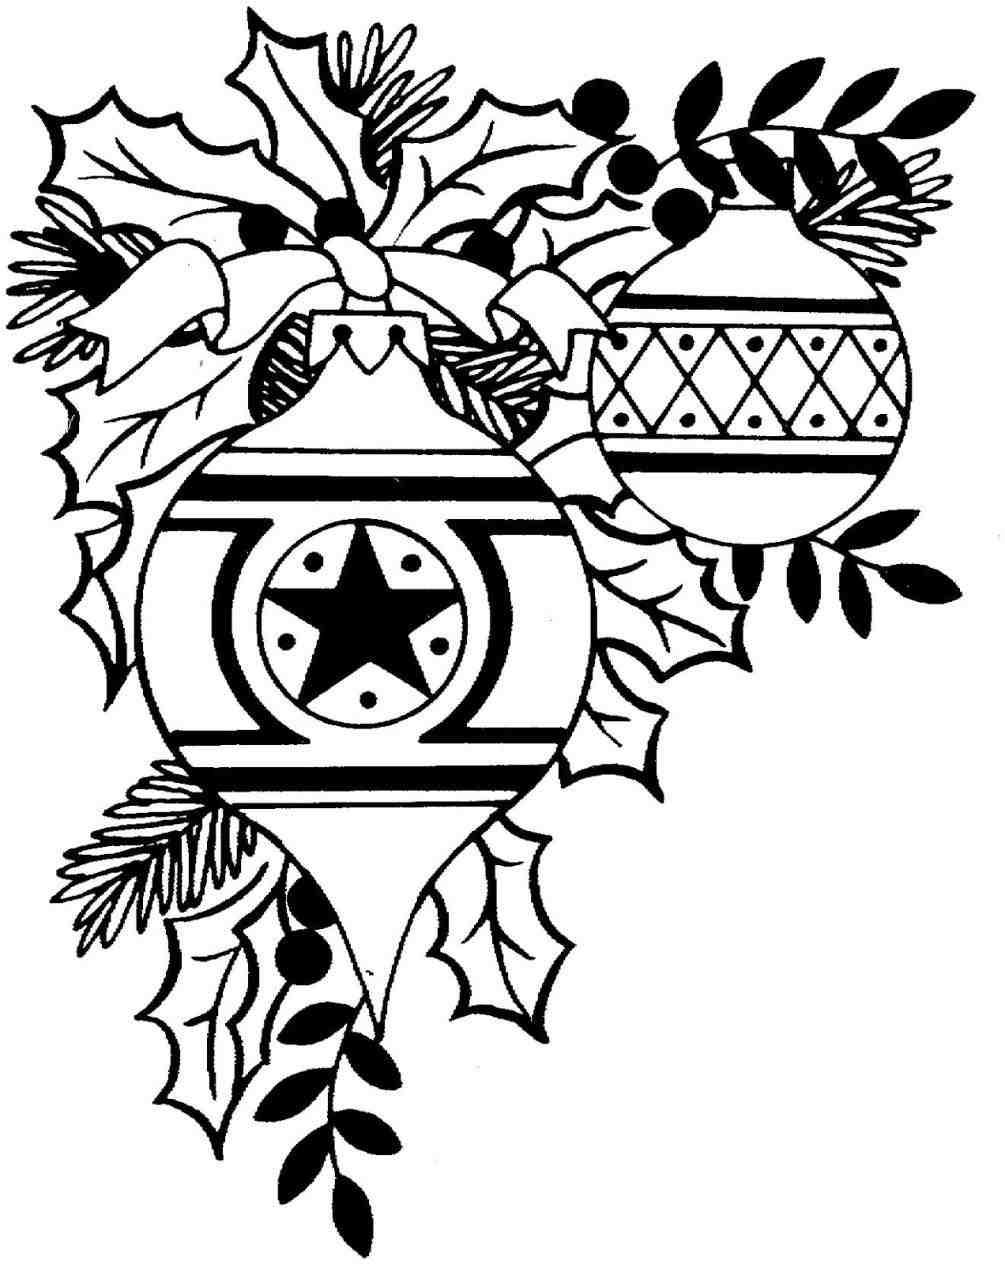 1005x1264 Black And White Christmas Tree Clip Art Cheminee.website